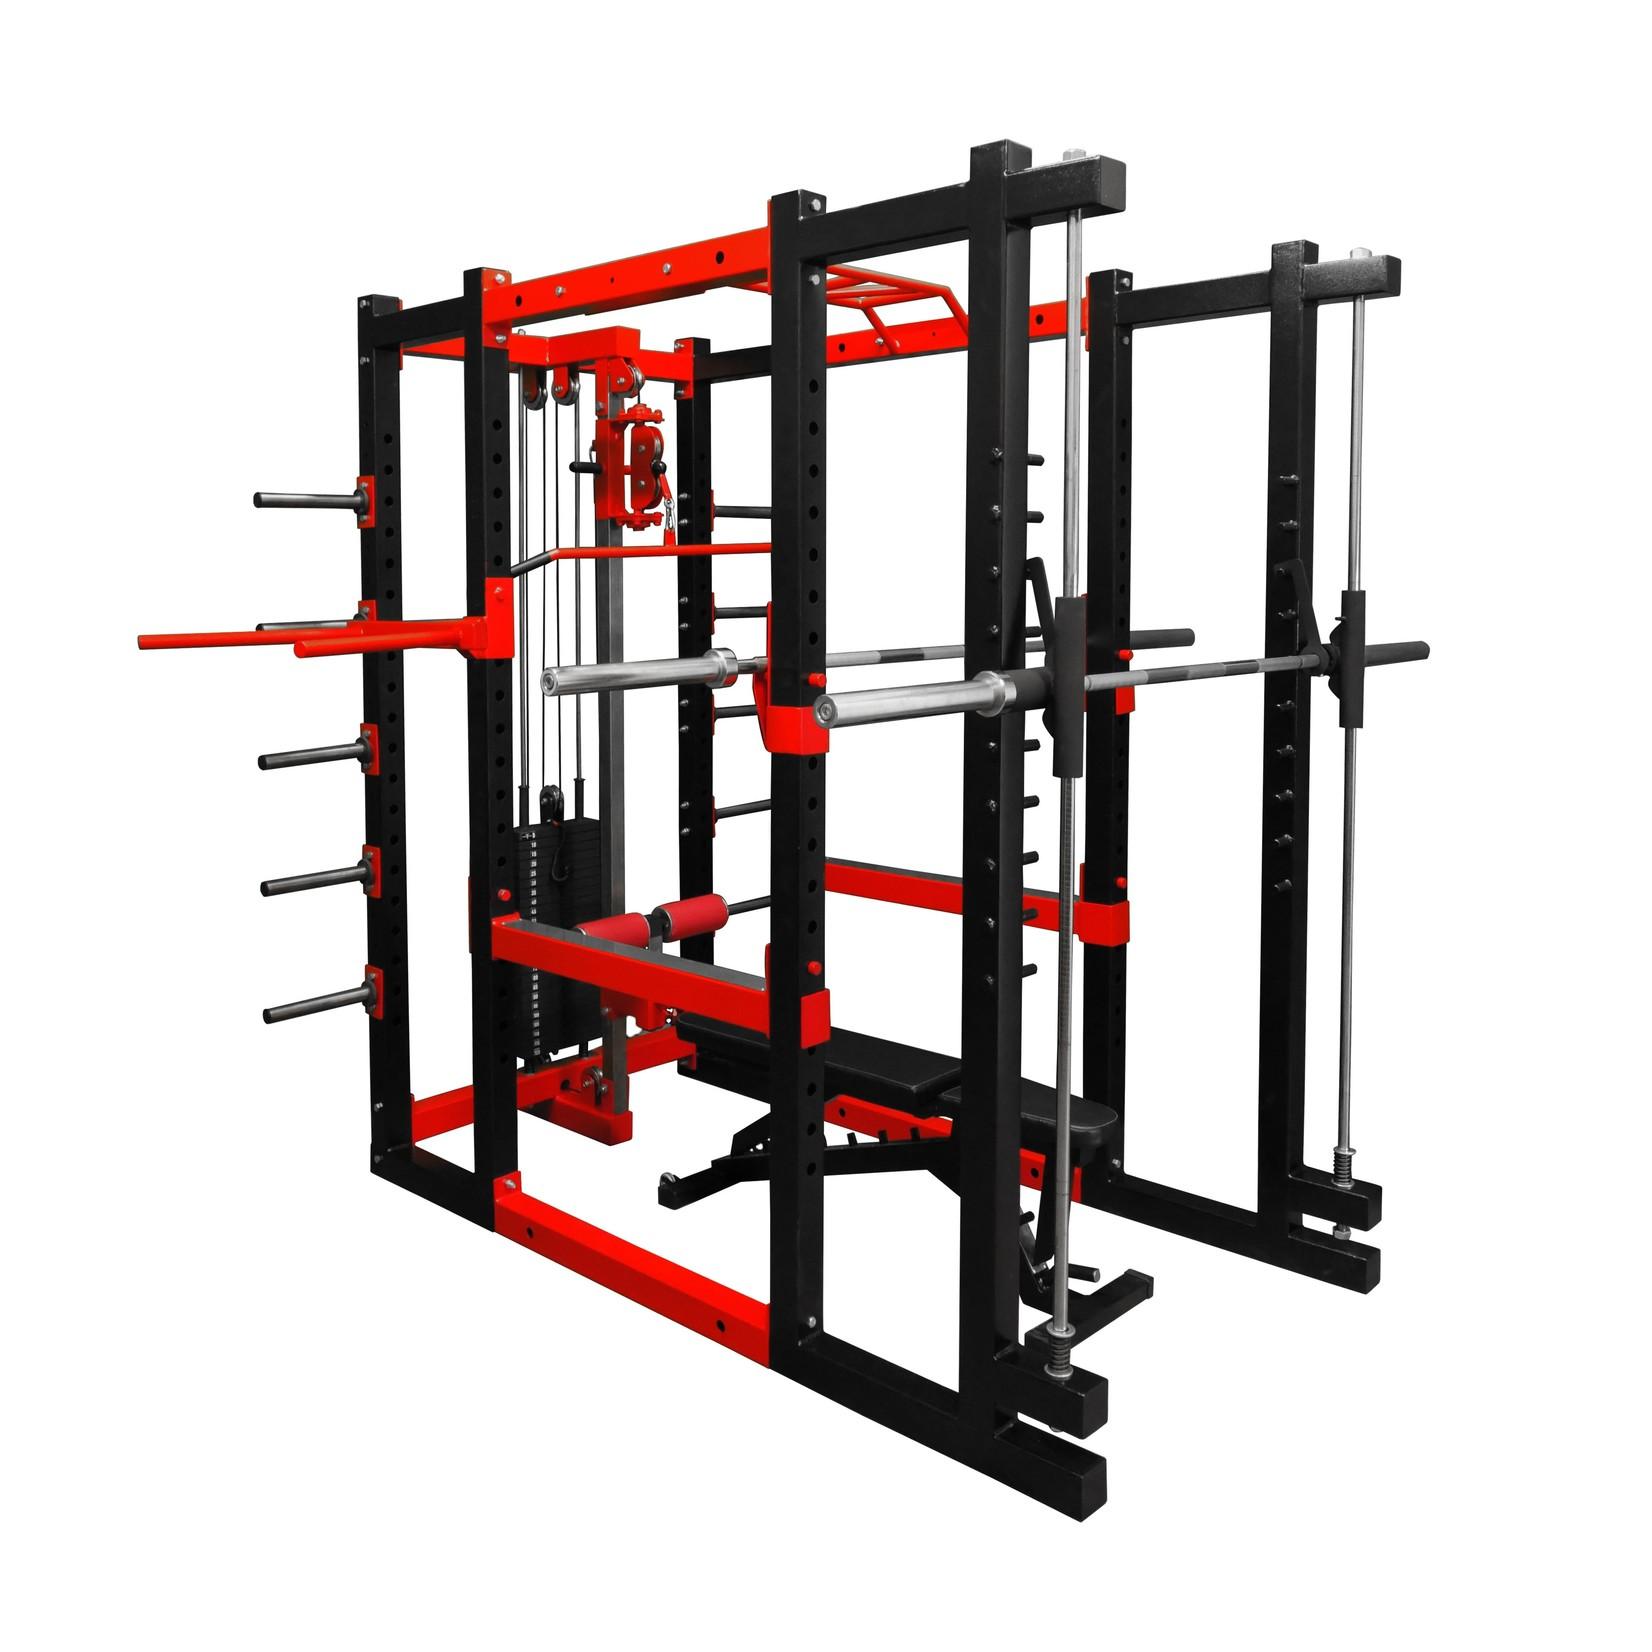 Multifunctional Power Rack 9B